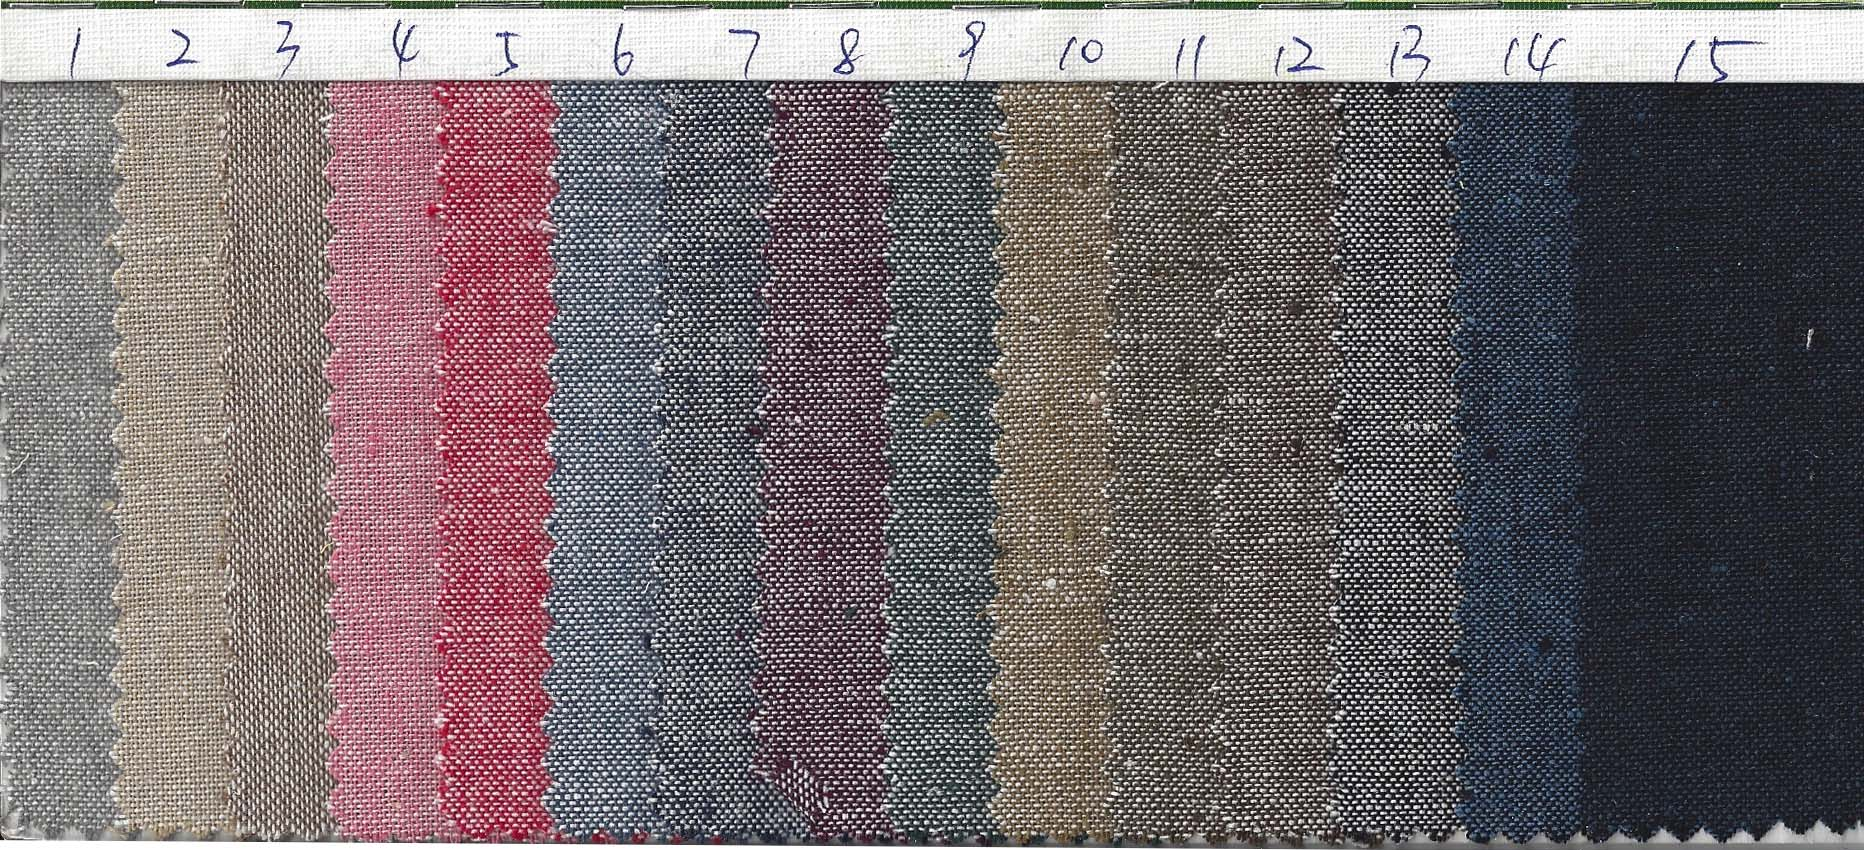 Guang Xin Linen Cotton GL182.jpg